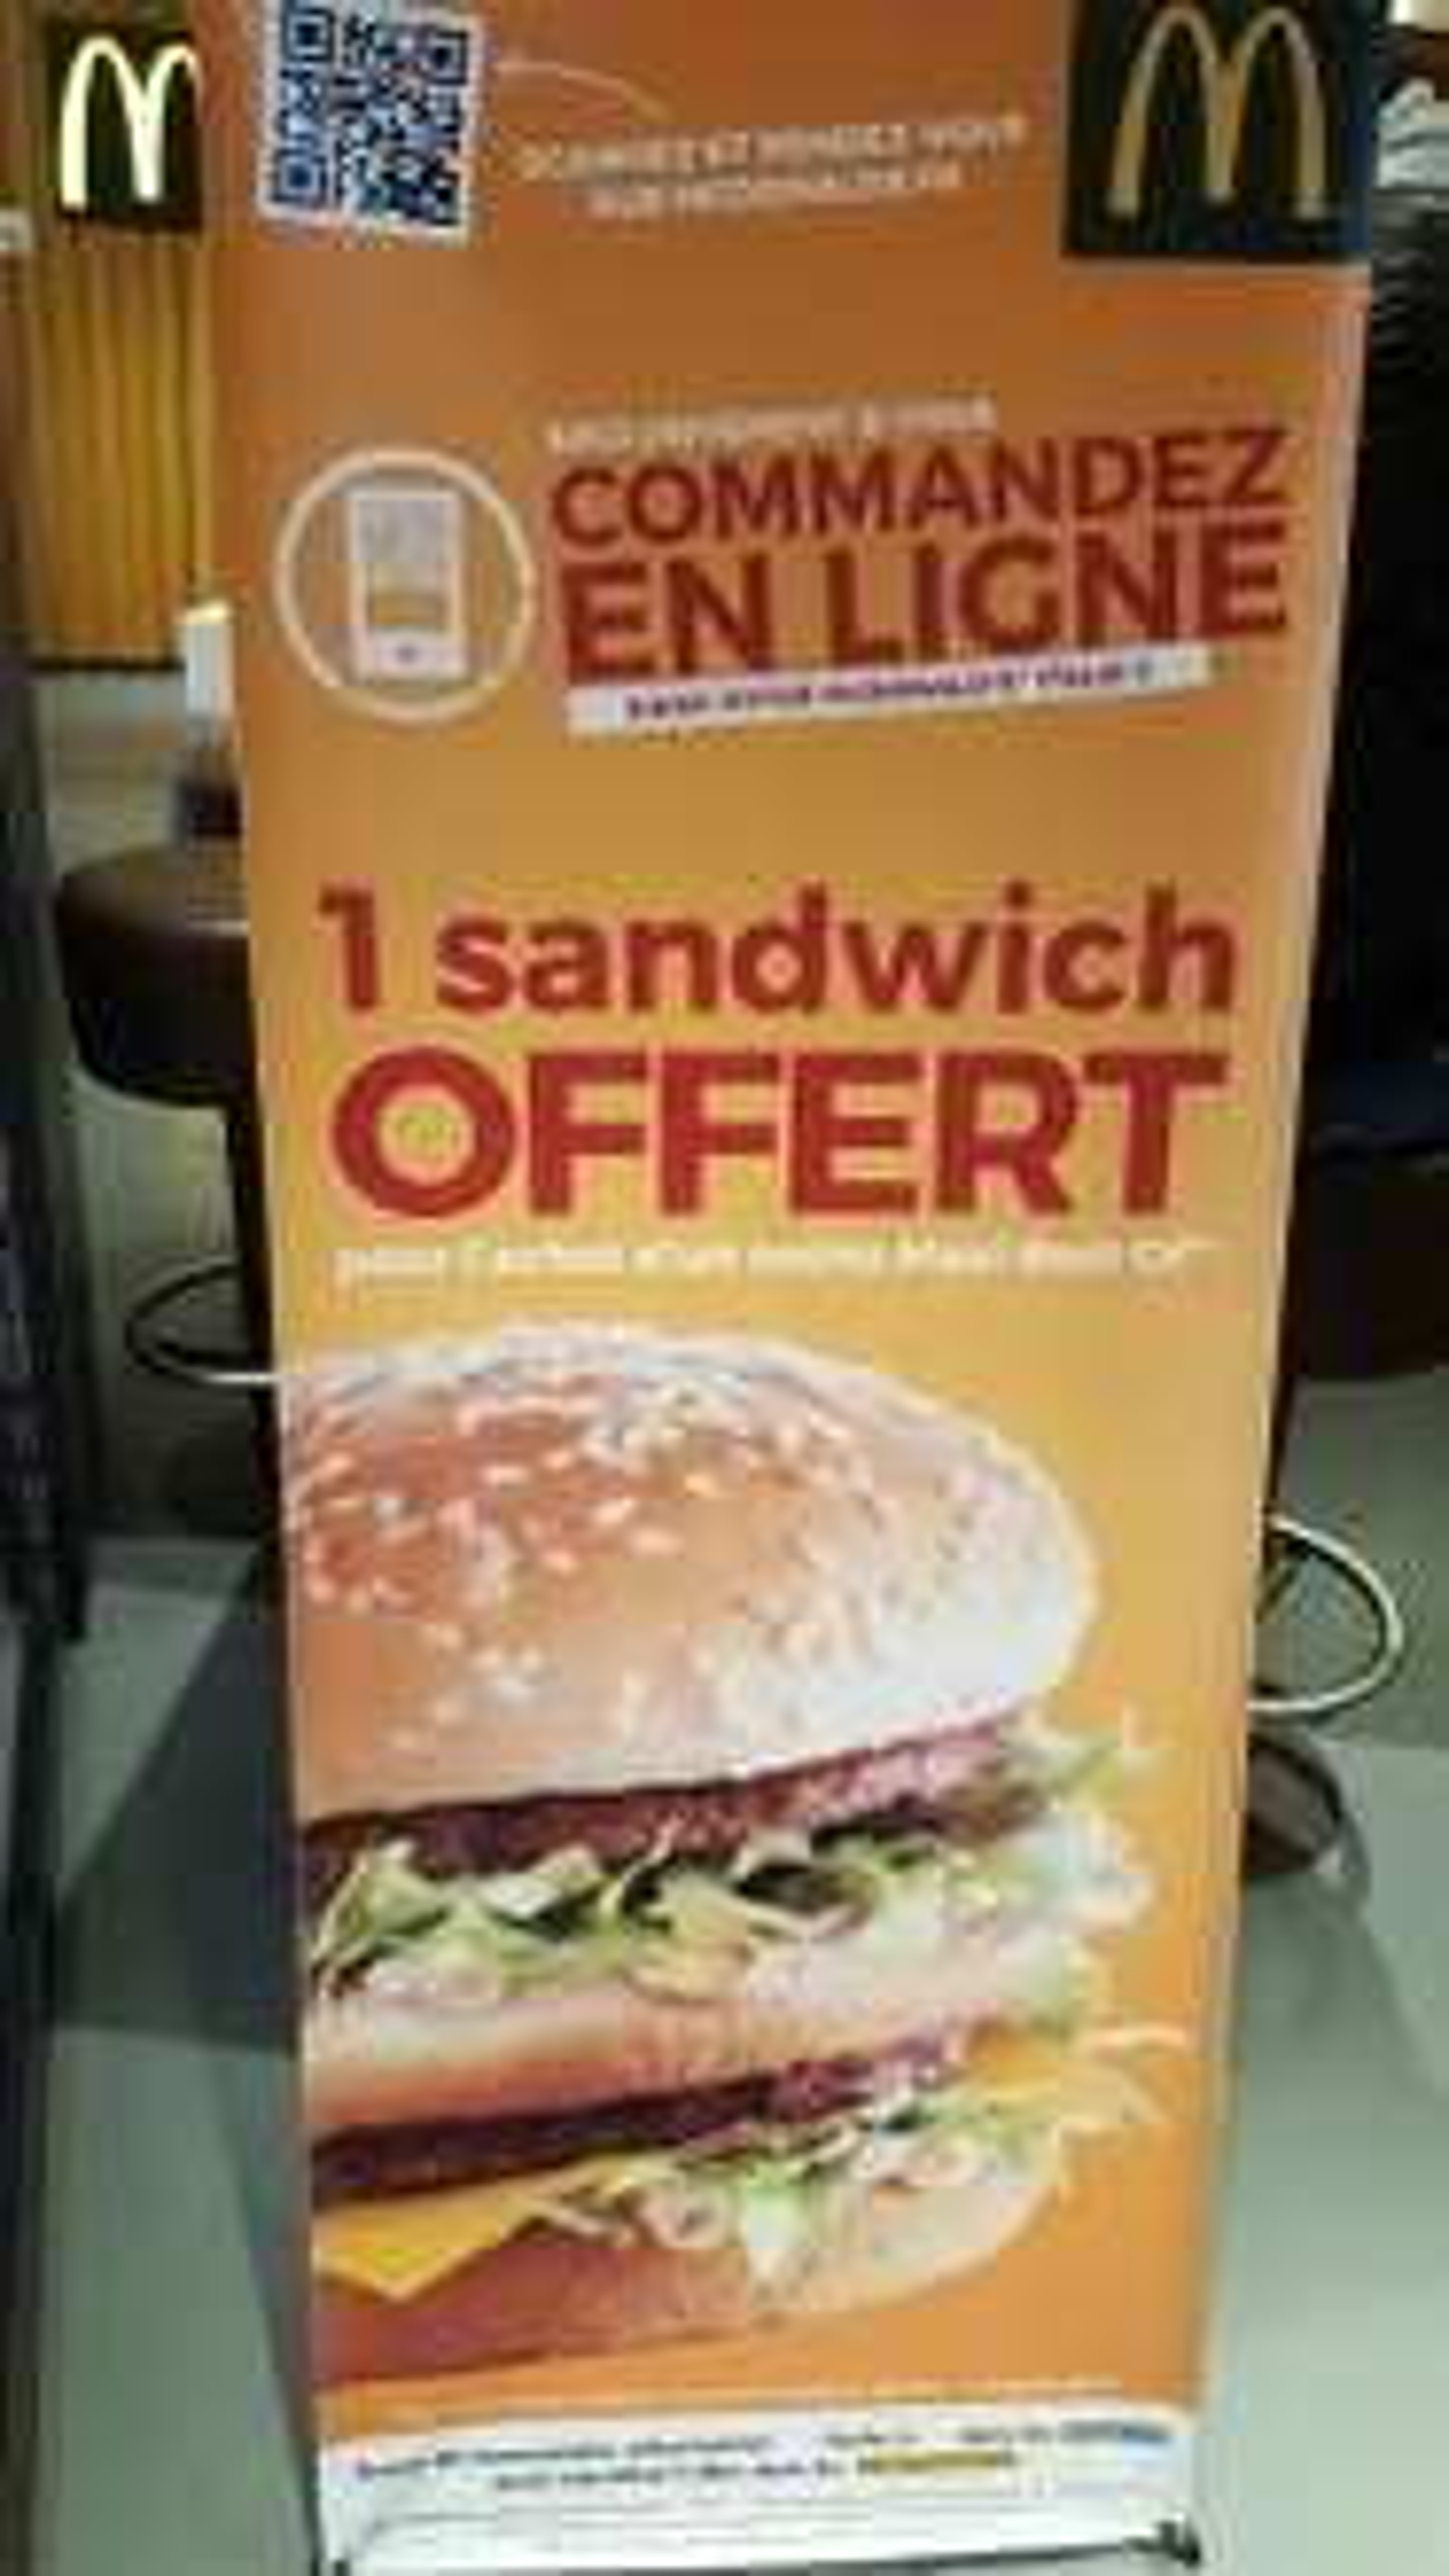 1 menu Maxi Best Of en ligne acheté = 1 sandwich OFFERT